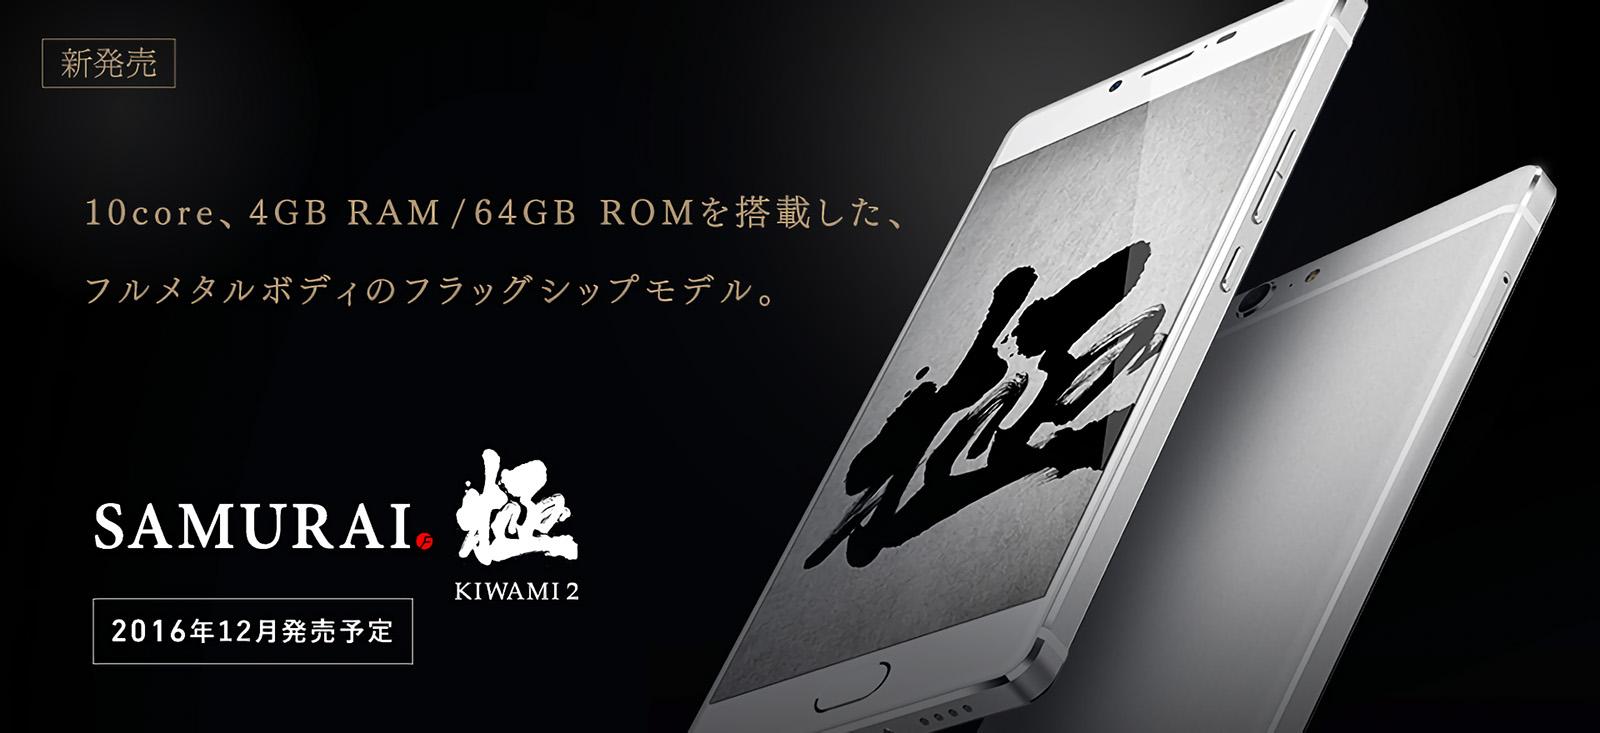 Freetel SAMURAI KIWAMI(極) 2